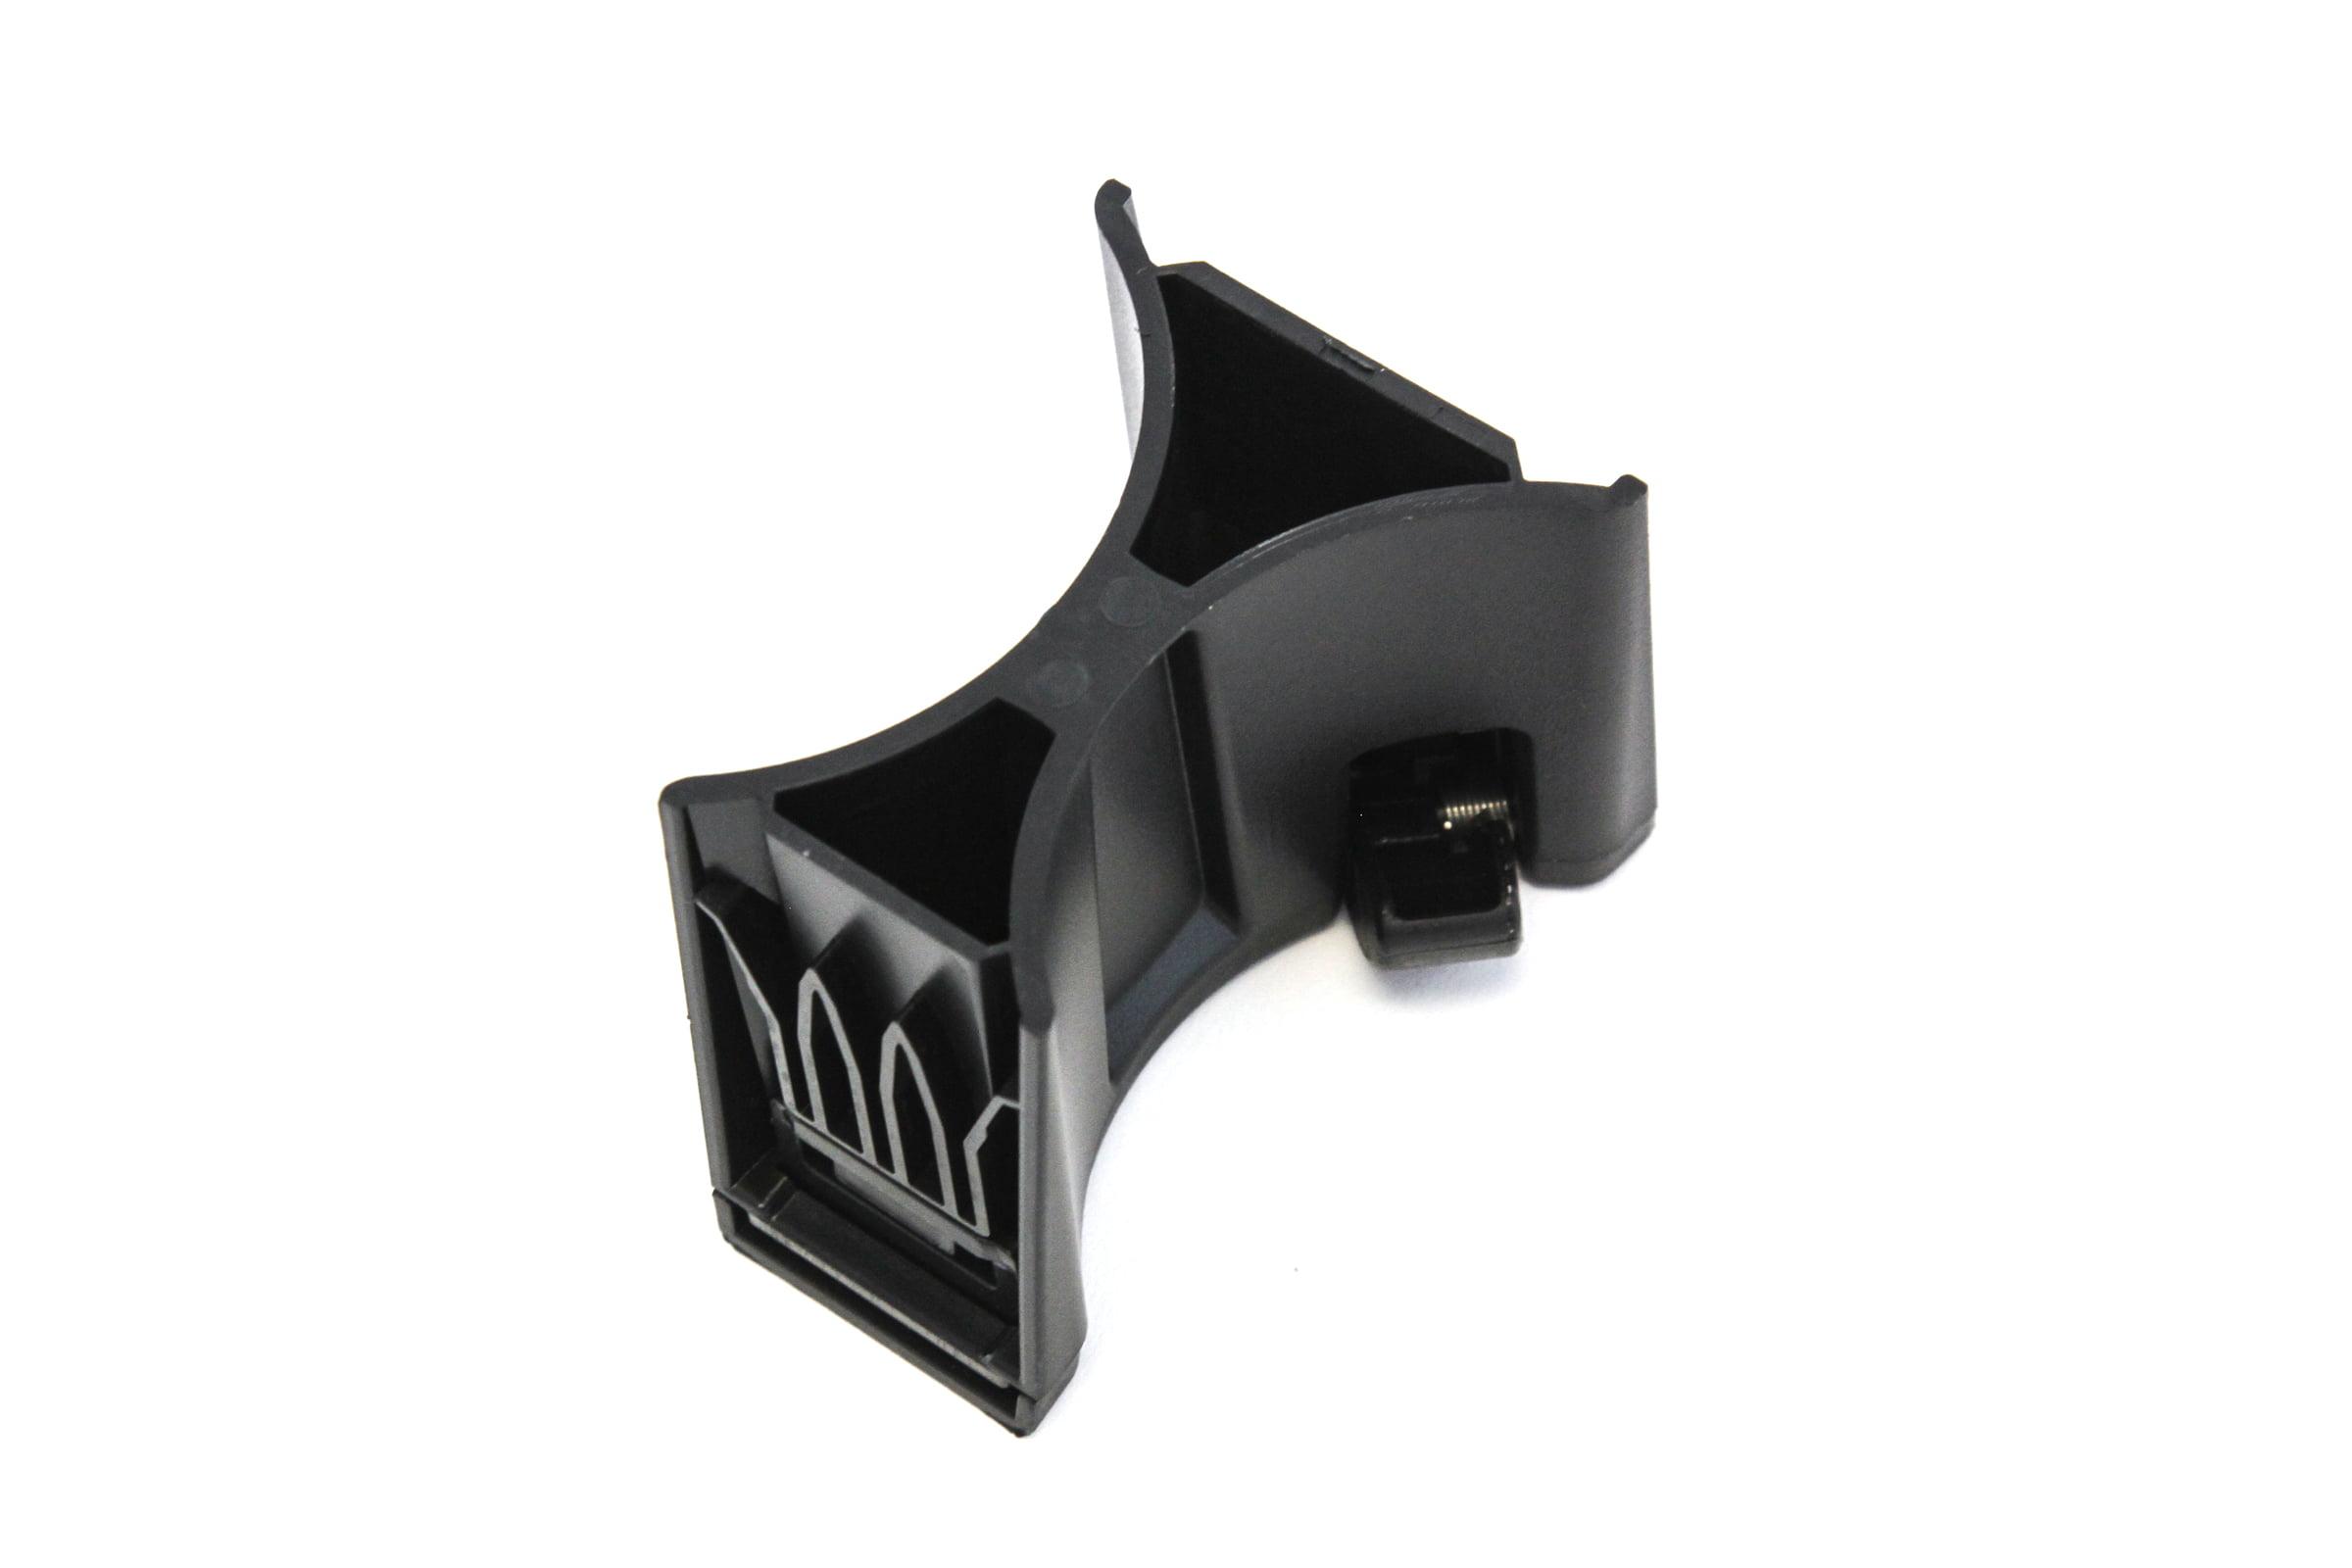 Red Hound Auto Cup Holder Divider Insert Center Console Black New ...